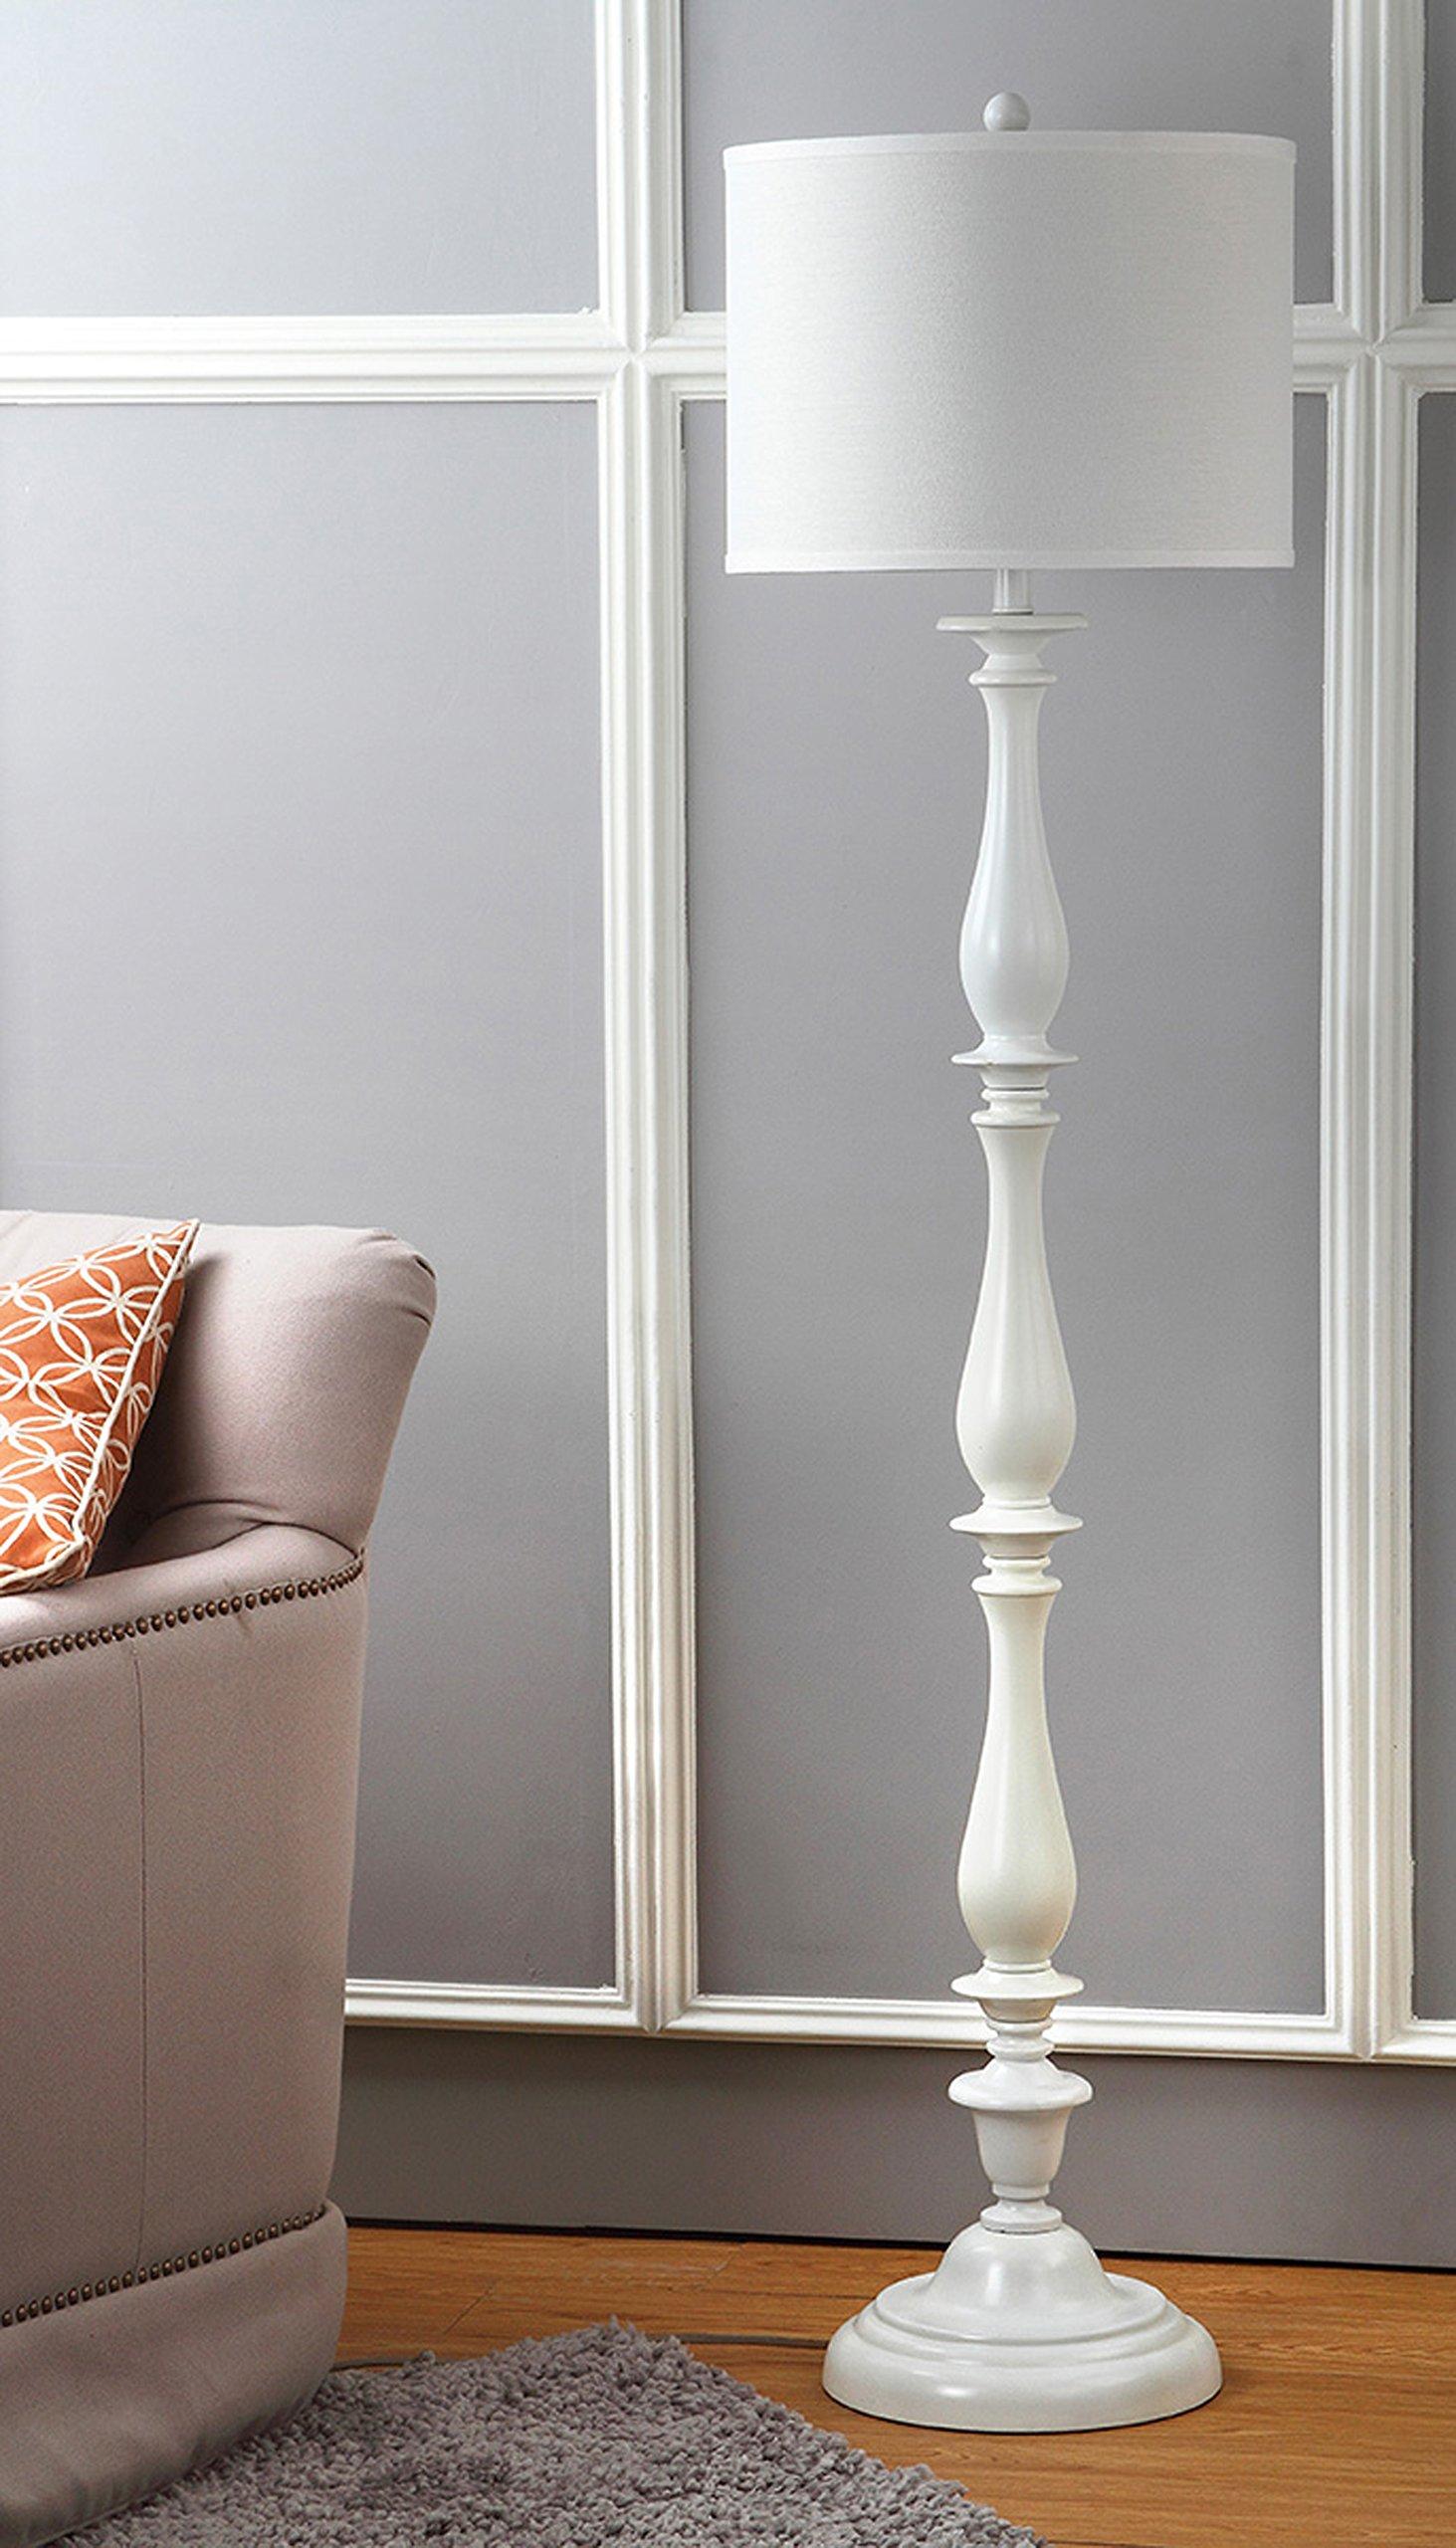 Safavieh Lighting Collection Bessie Candlestick White 62-inch Floor Lamp by Safavieh